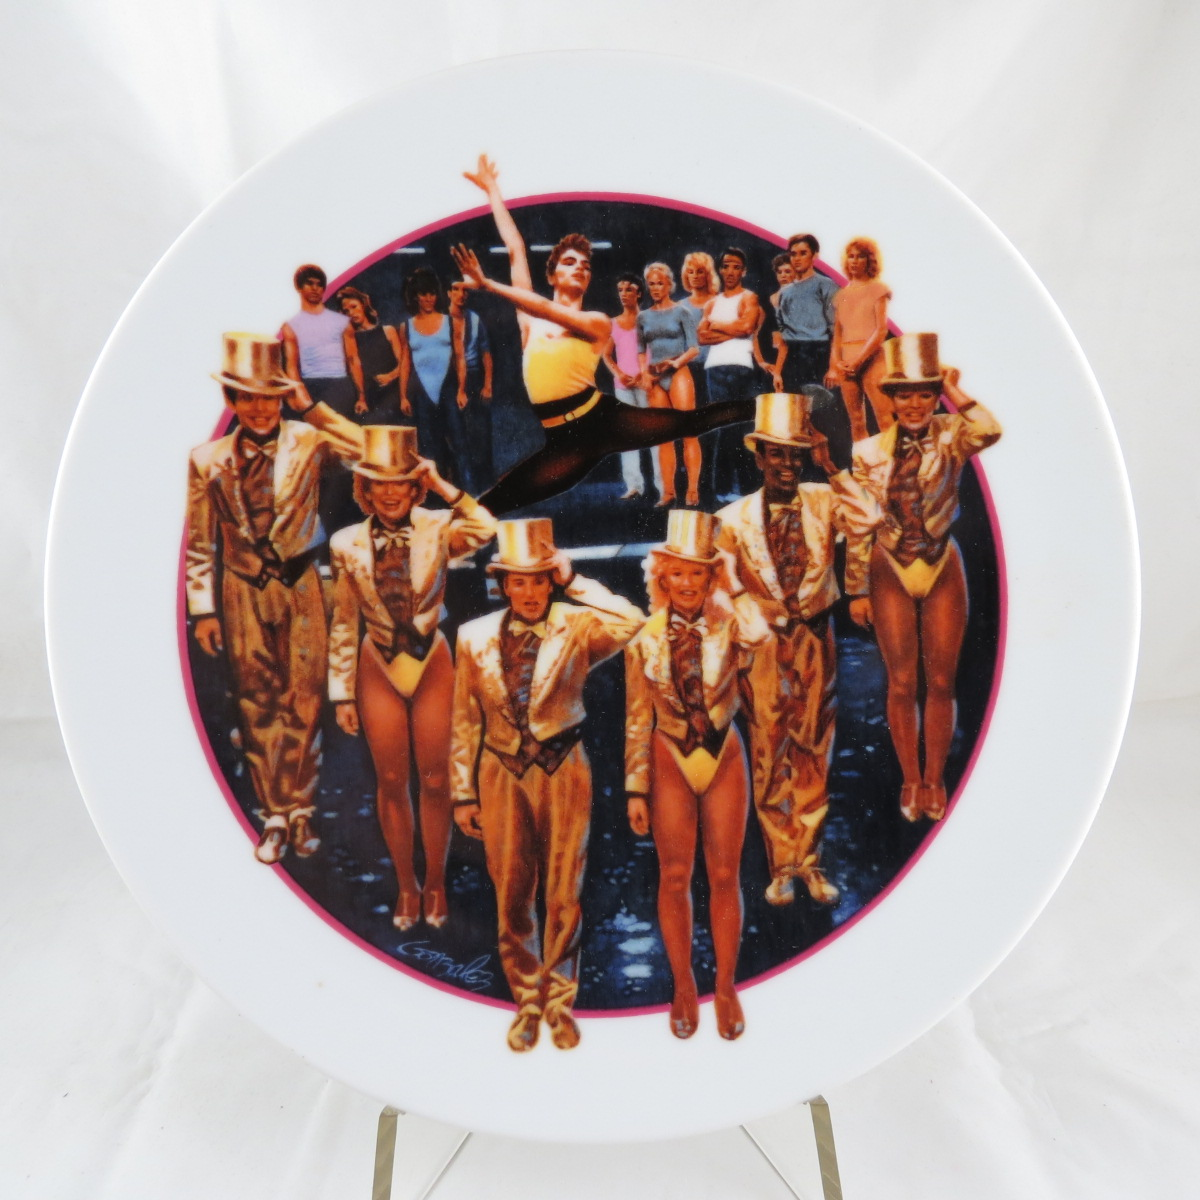 Декоративная коллекционная тарелка Эйвон. Изображения Голливуда: Кардебалет, Фарфор, деколь. США, AVON. EMBASY. 1985 avon